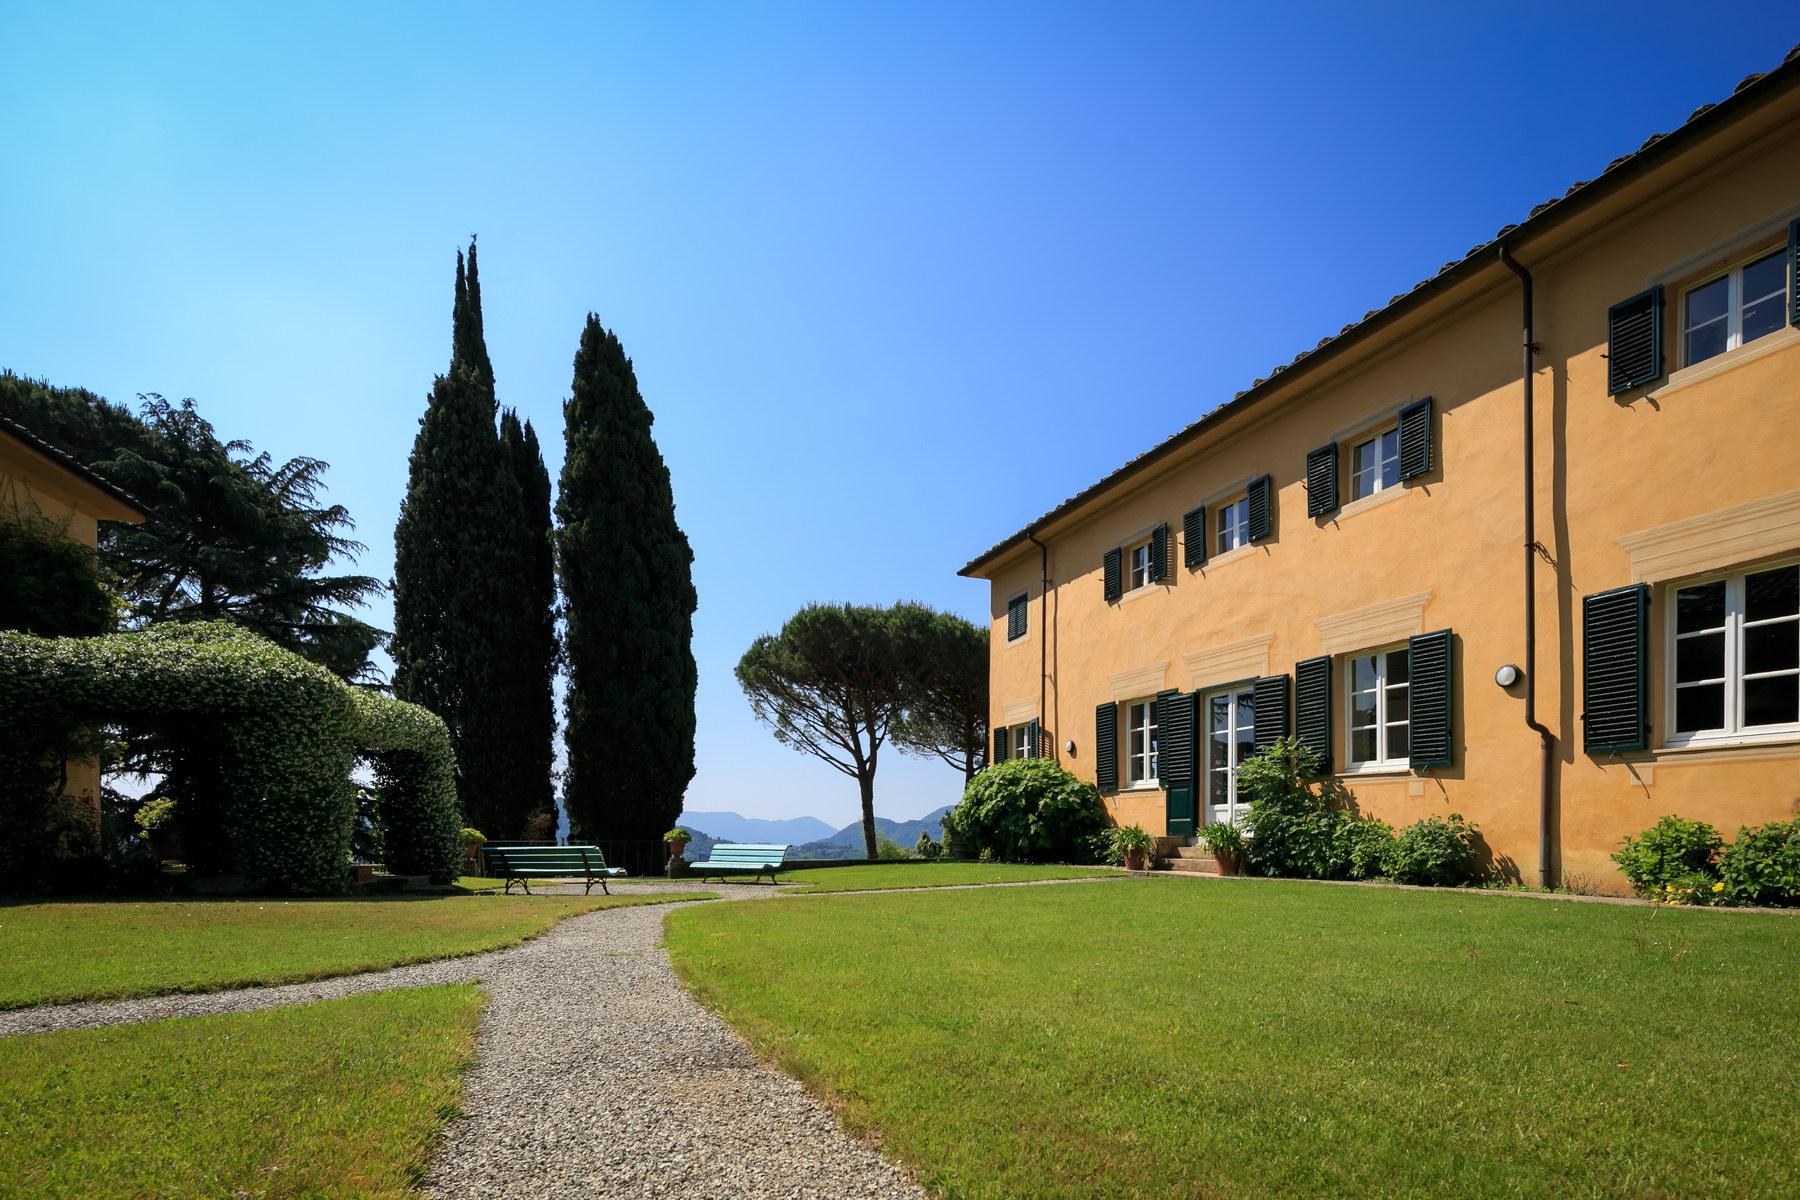 Villa in Vendita a Lucca: 5 locali, 1500 mq - Foto 3